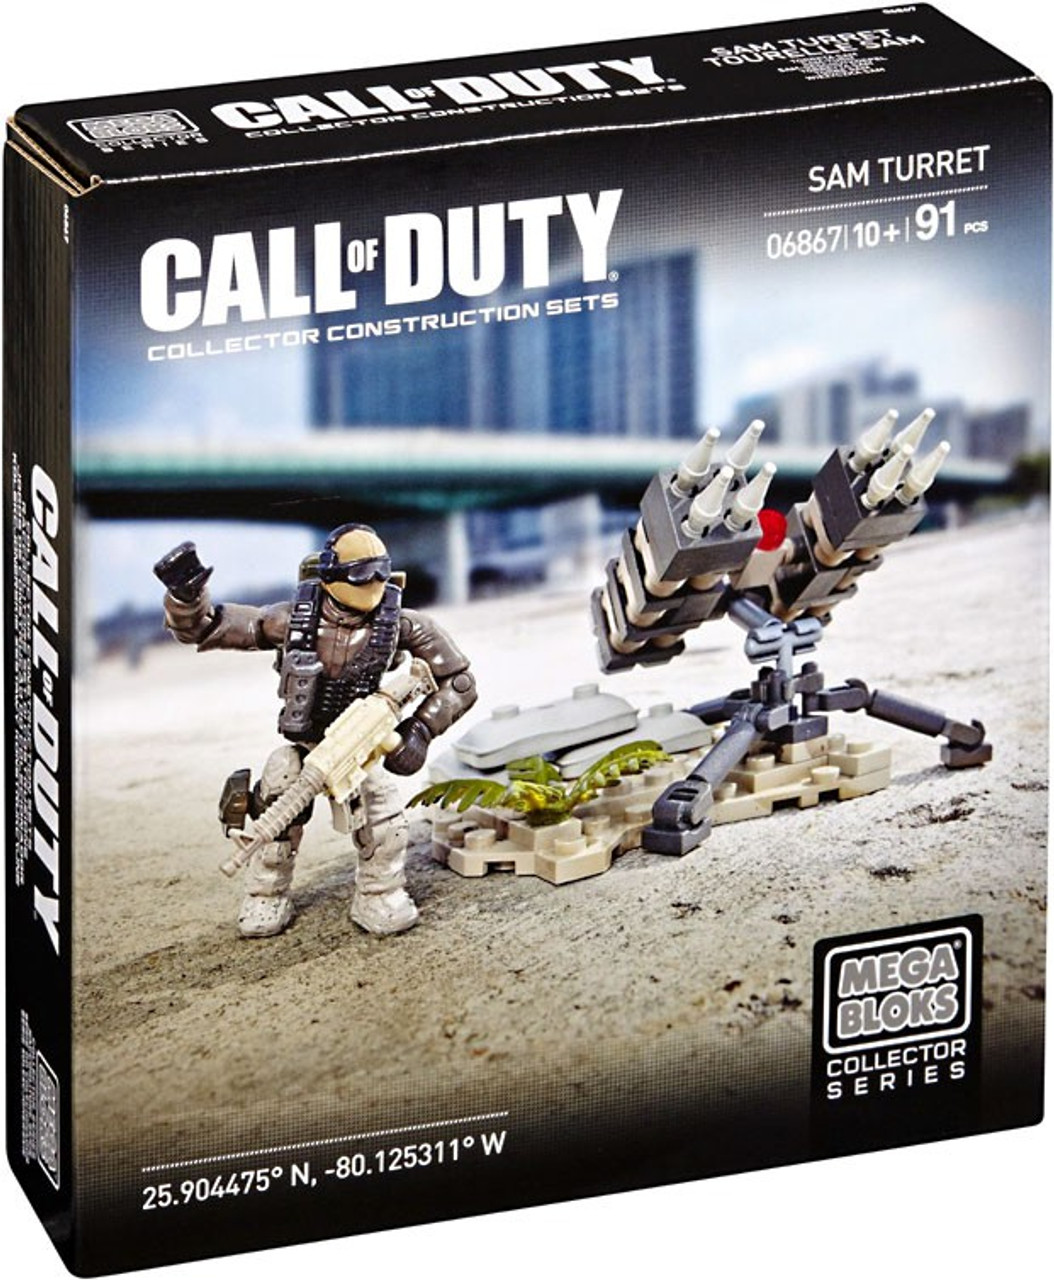 Mega Bloks Call of Duty SAM Turret Set #06867